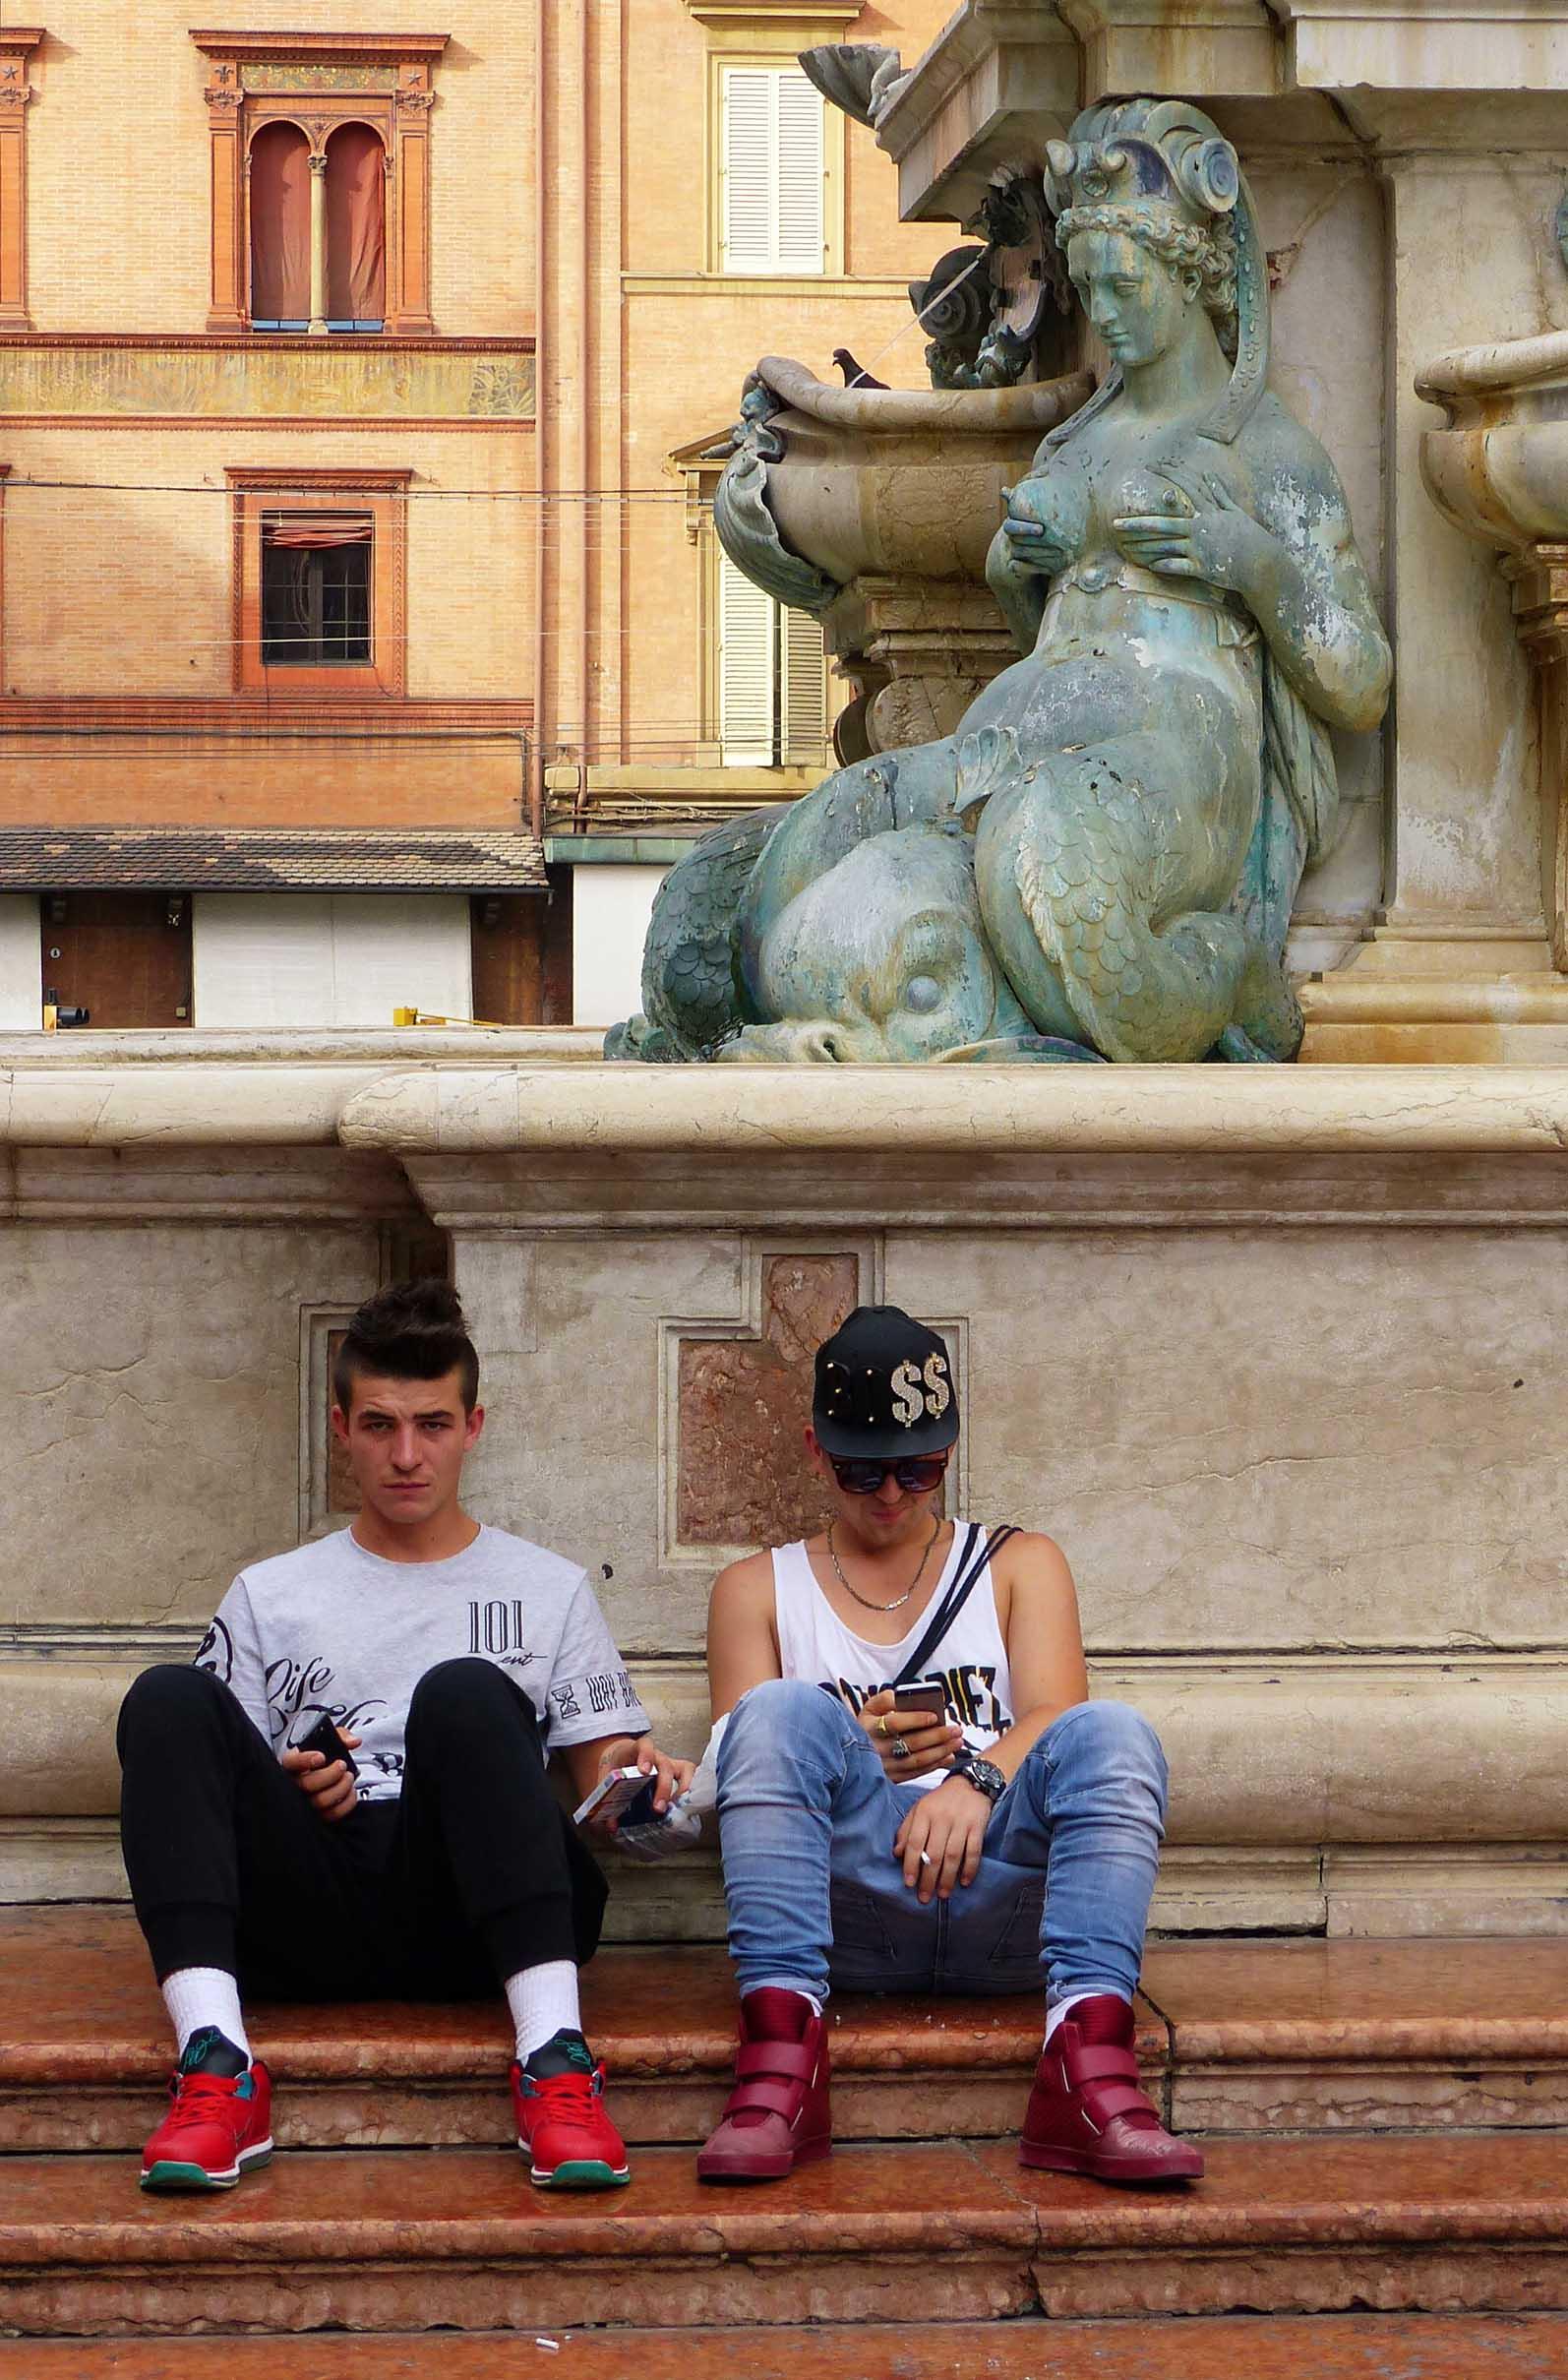 Two teenage boys sitting on steps below a fountain